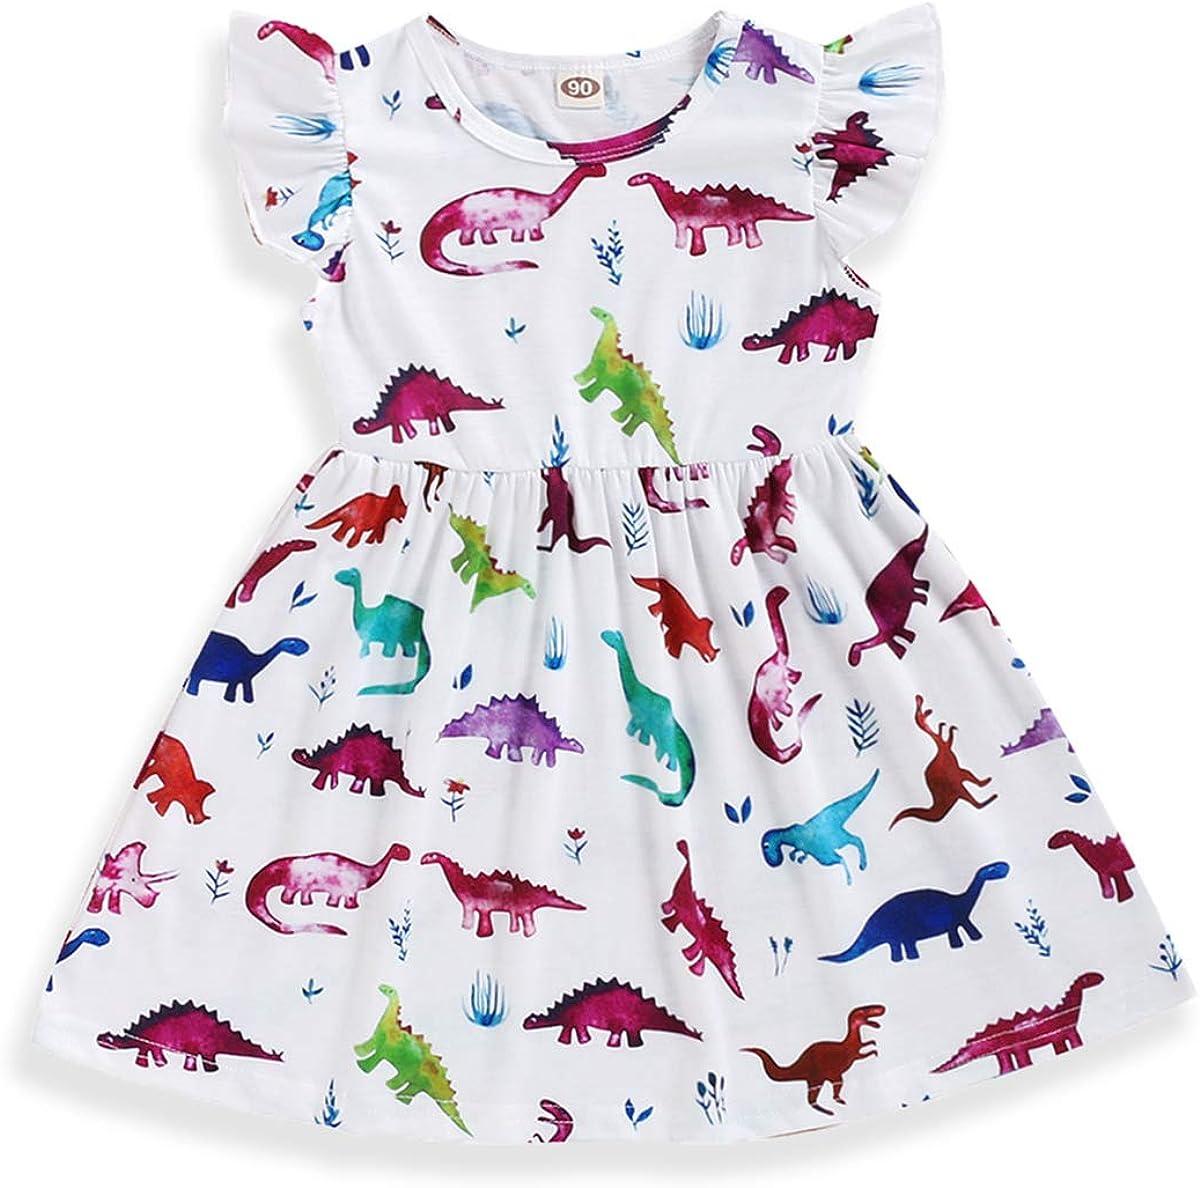 Happy Town Kids Baby Girls Dinosaur Dress Clothes Fly Ruffle Sleeve Dinosaur Tutu Skirt Sundress Summer Casual Dress